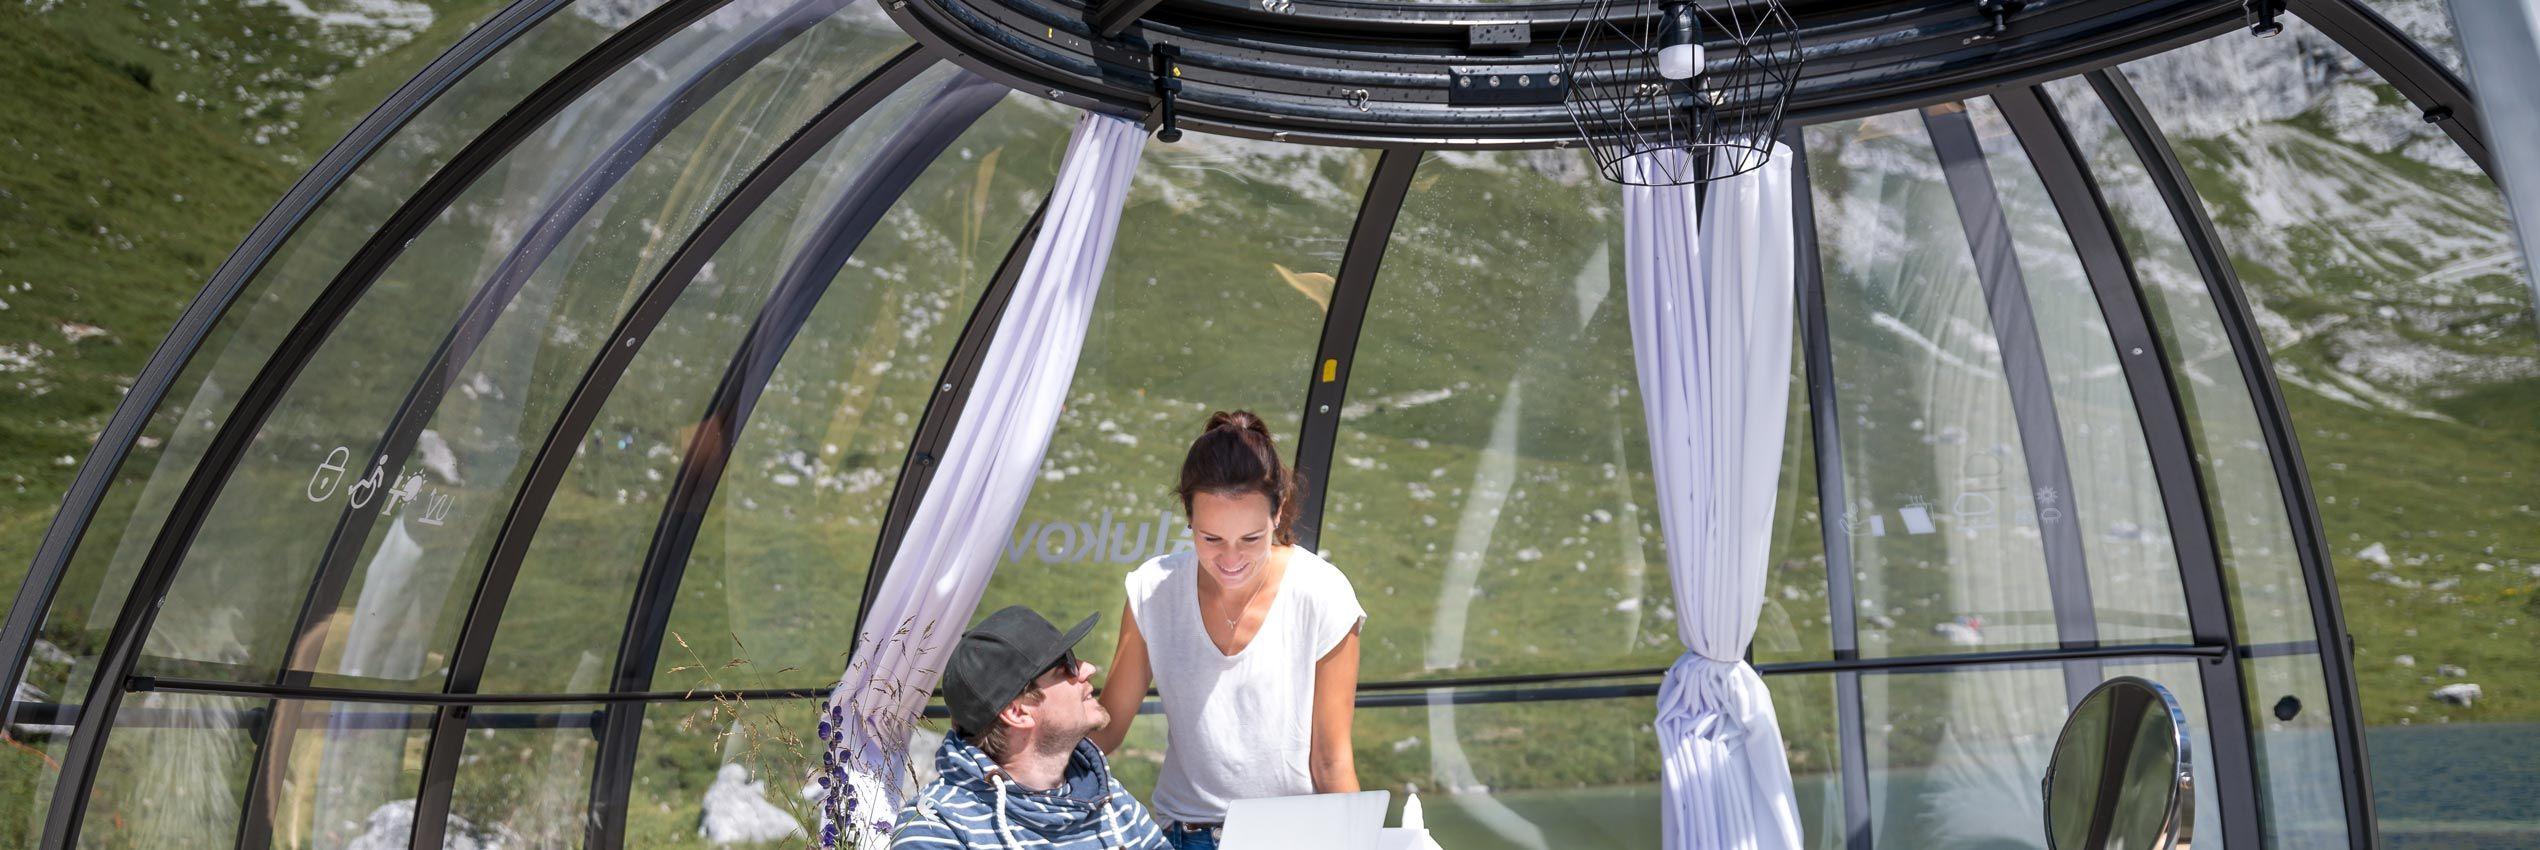 Opened enclosure Spa Dome Orlando